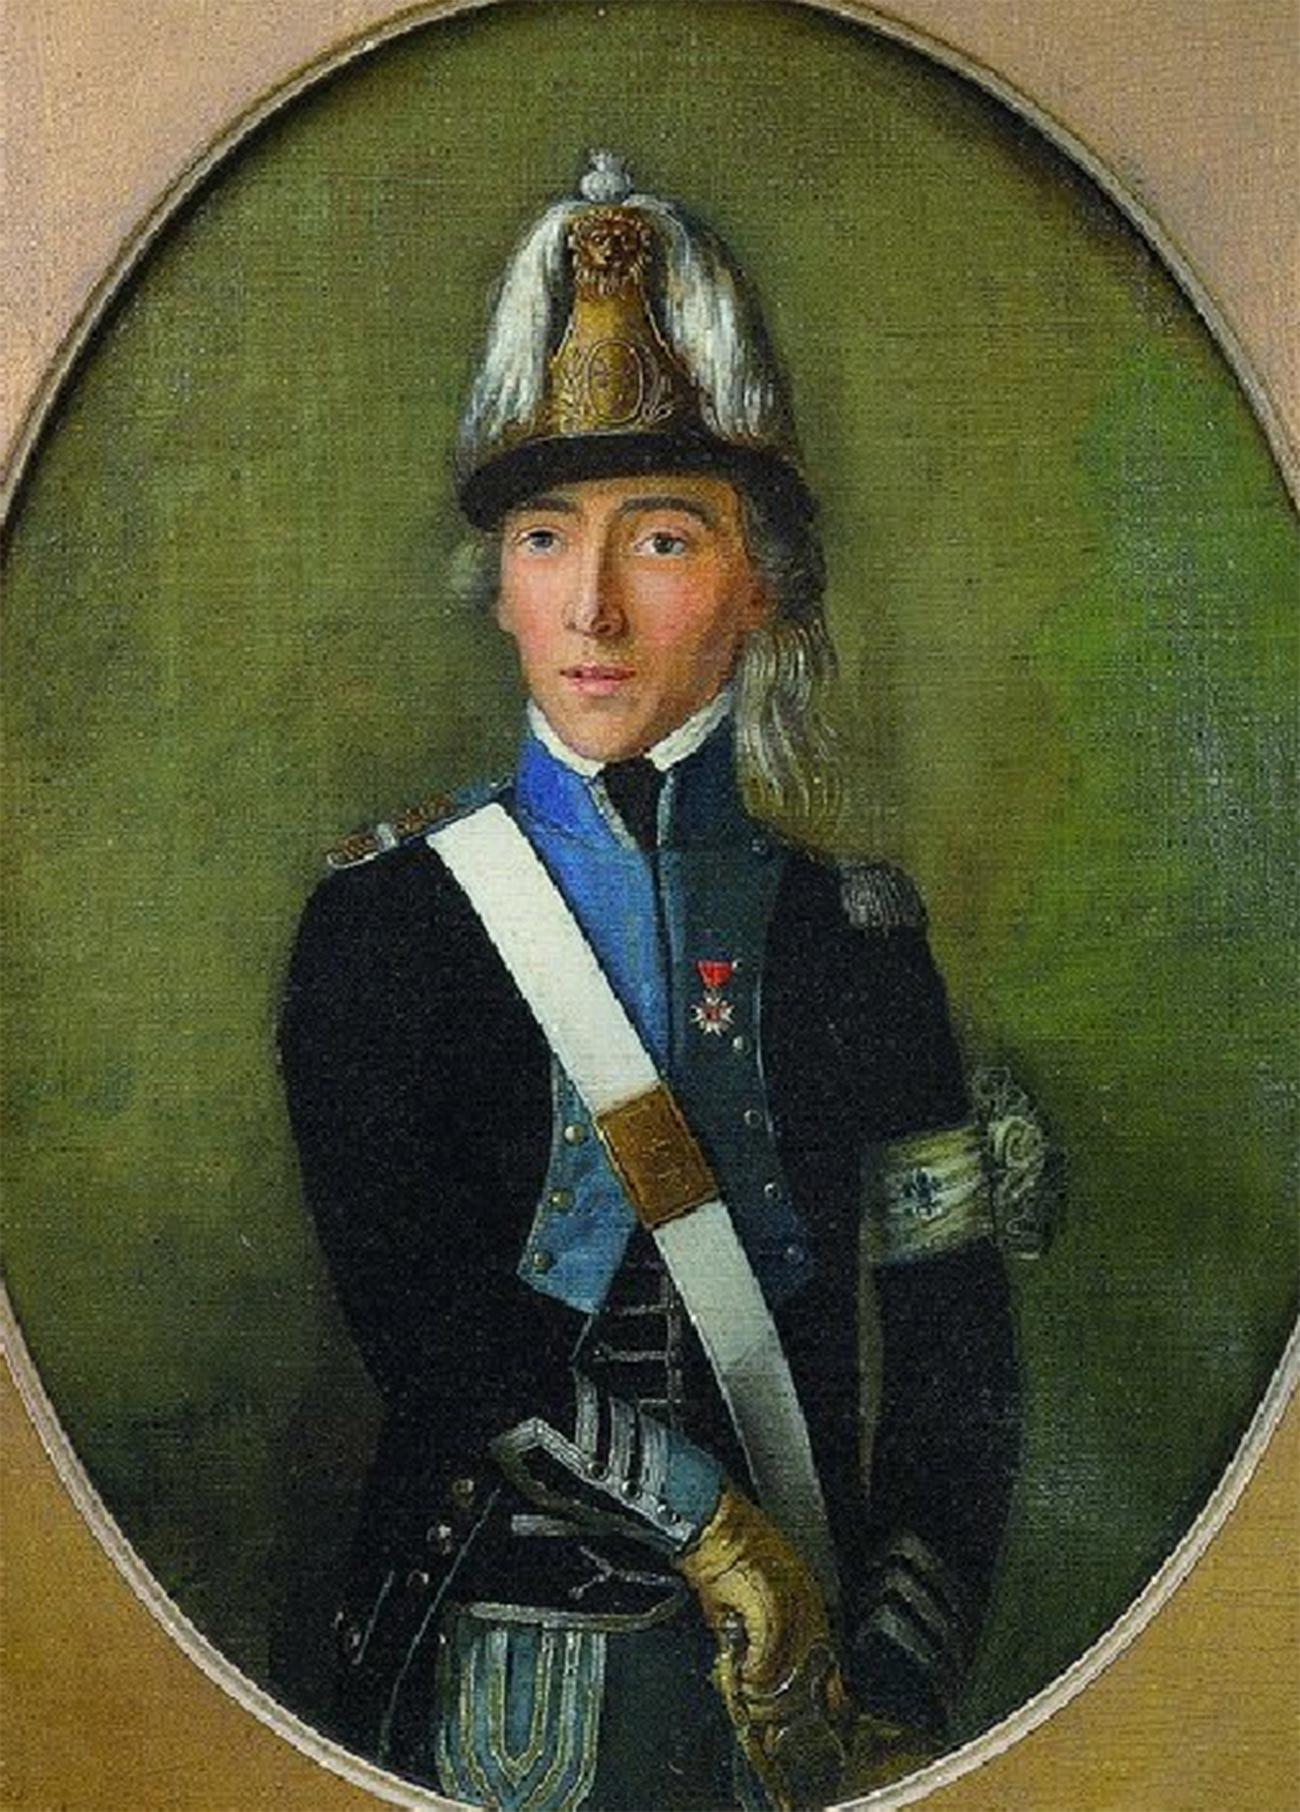 Портрет капитана корпуса Конде.